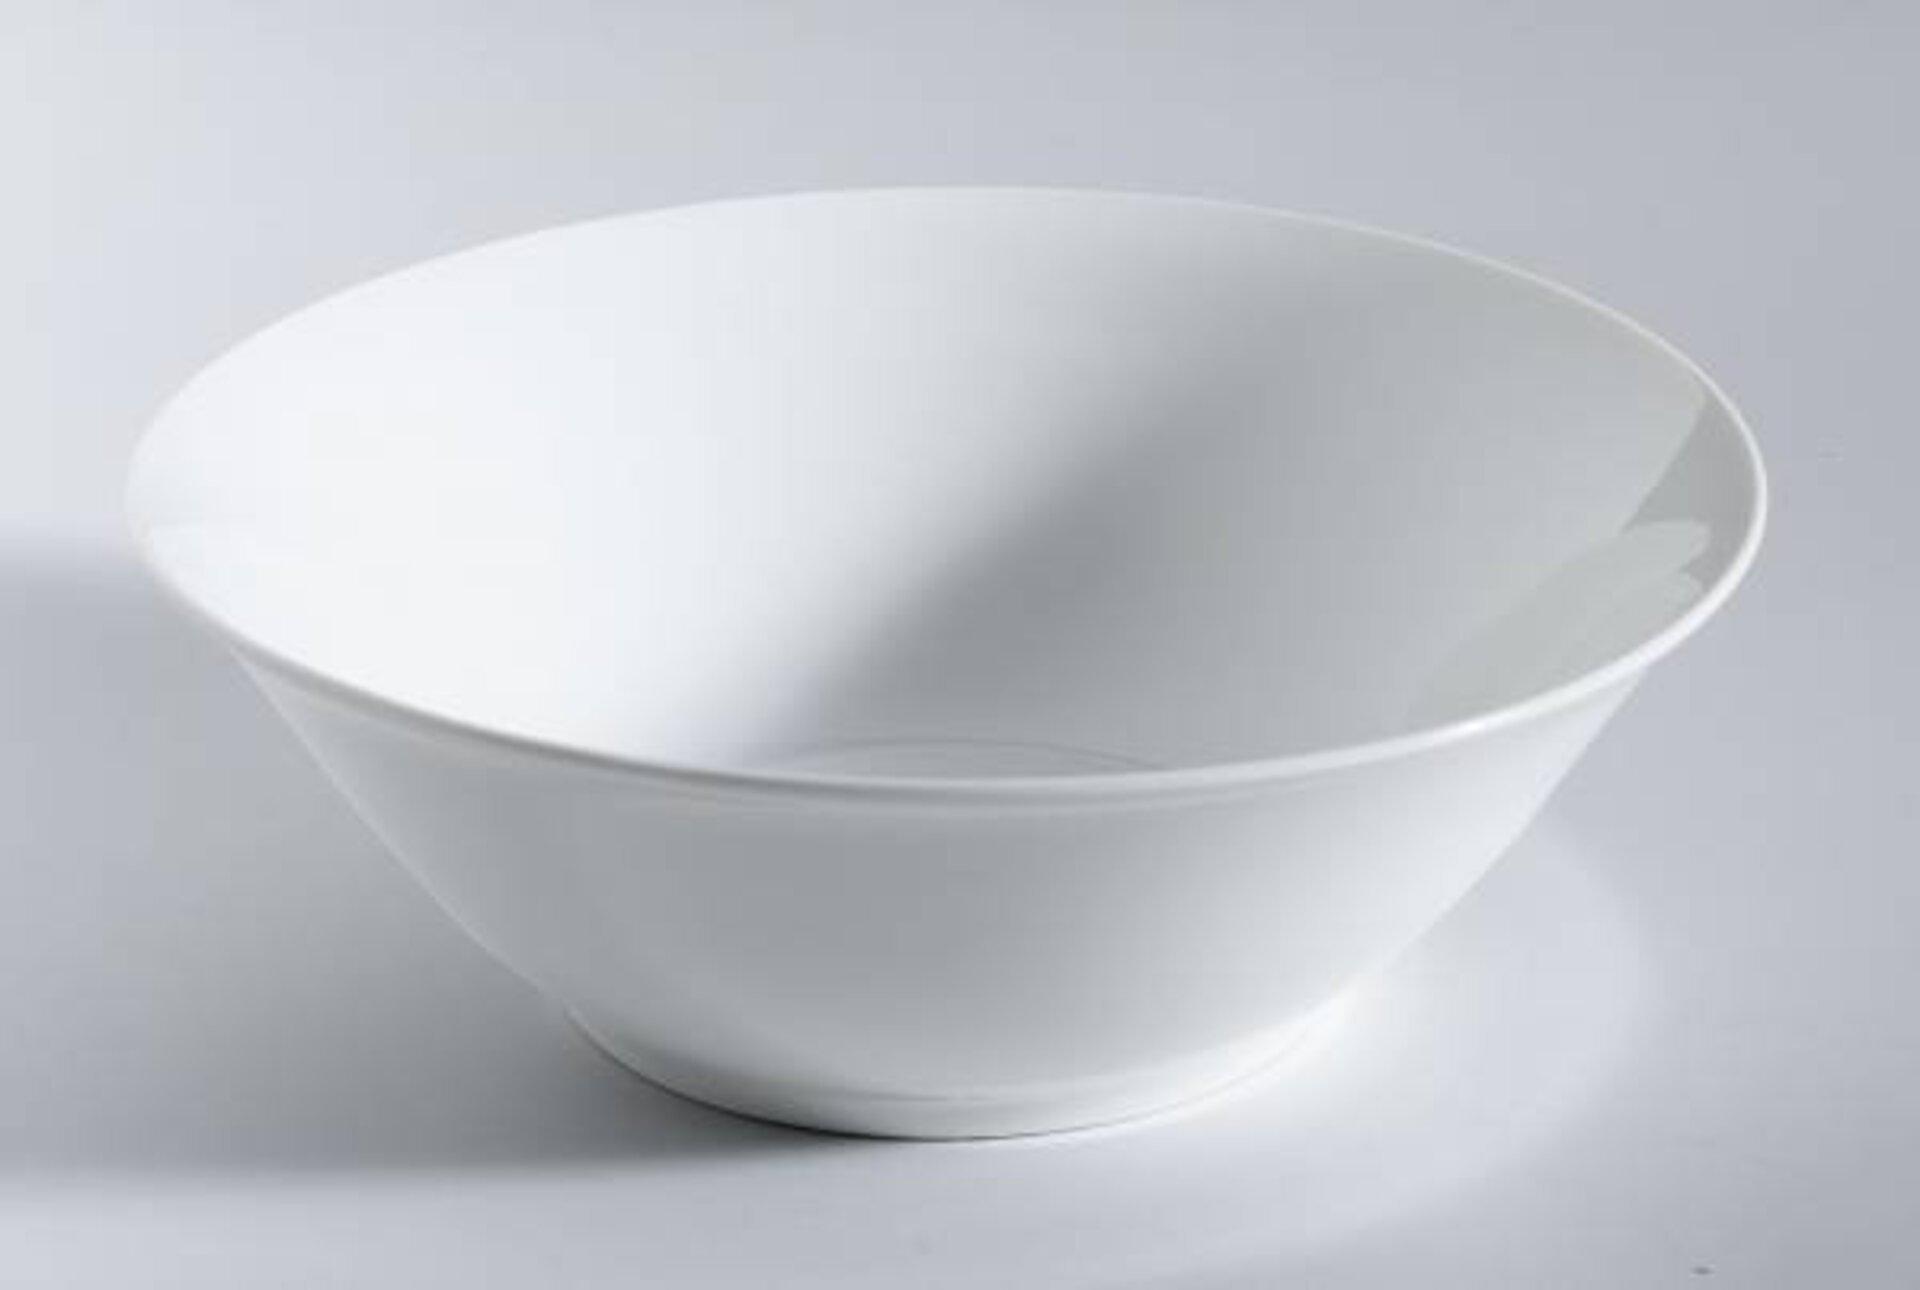 Geschirr Casa Nova Keramik weiß 23 x 6 x 13 cm